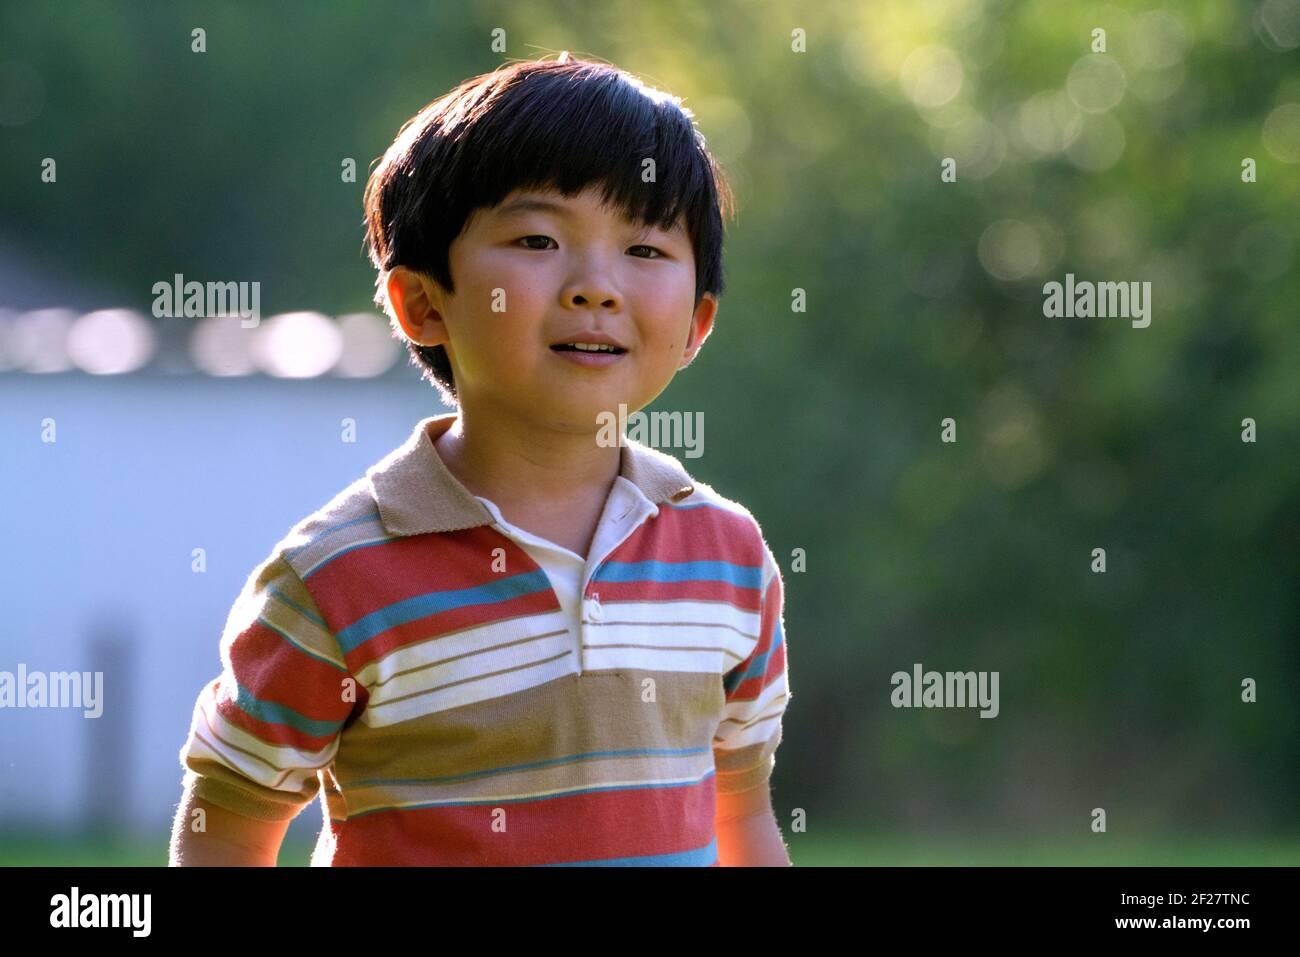 ALAN S. KIM, MINARI, 2020, ©JOSH ETHAN JOHNSON/PLAN BA24 Stockfoto